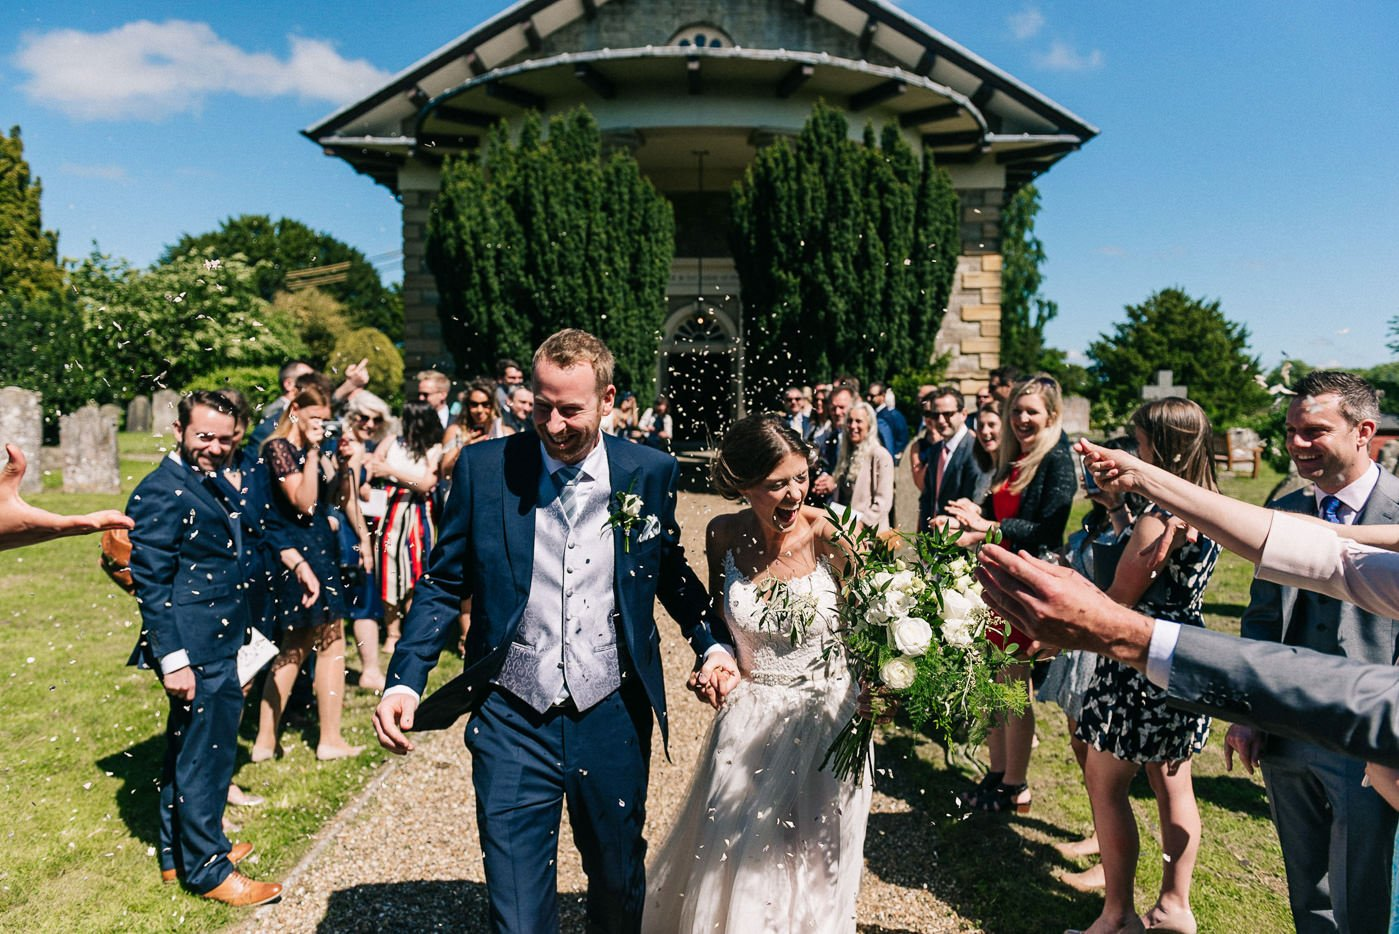 Sprivers Mansion Wedding confetti exit